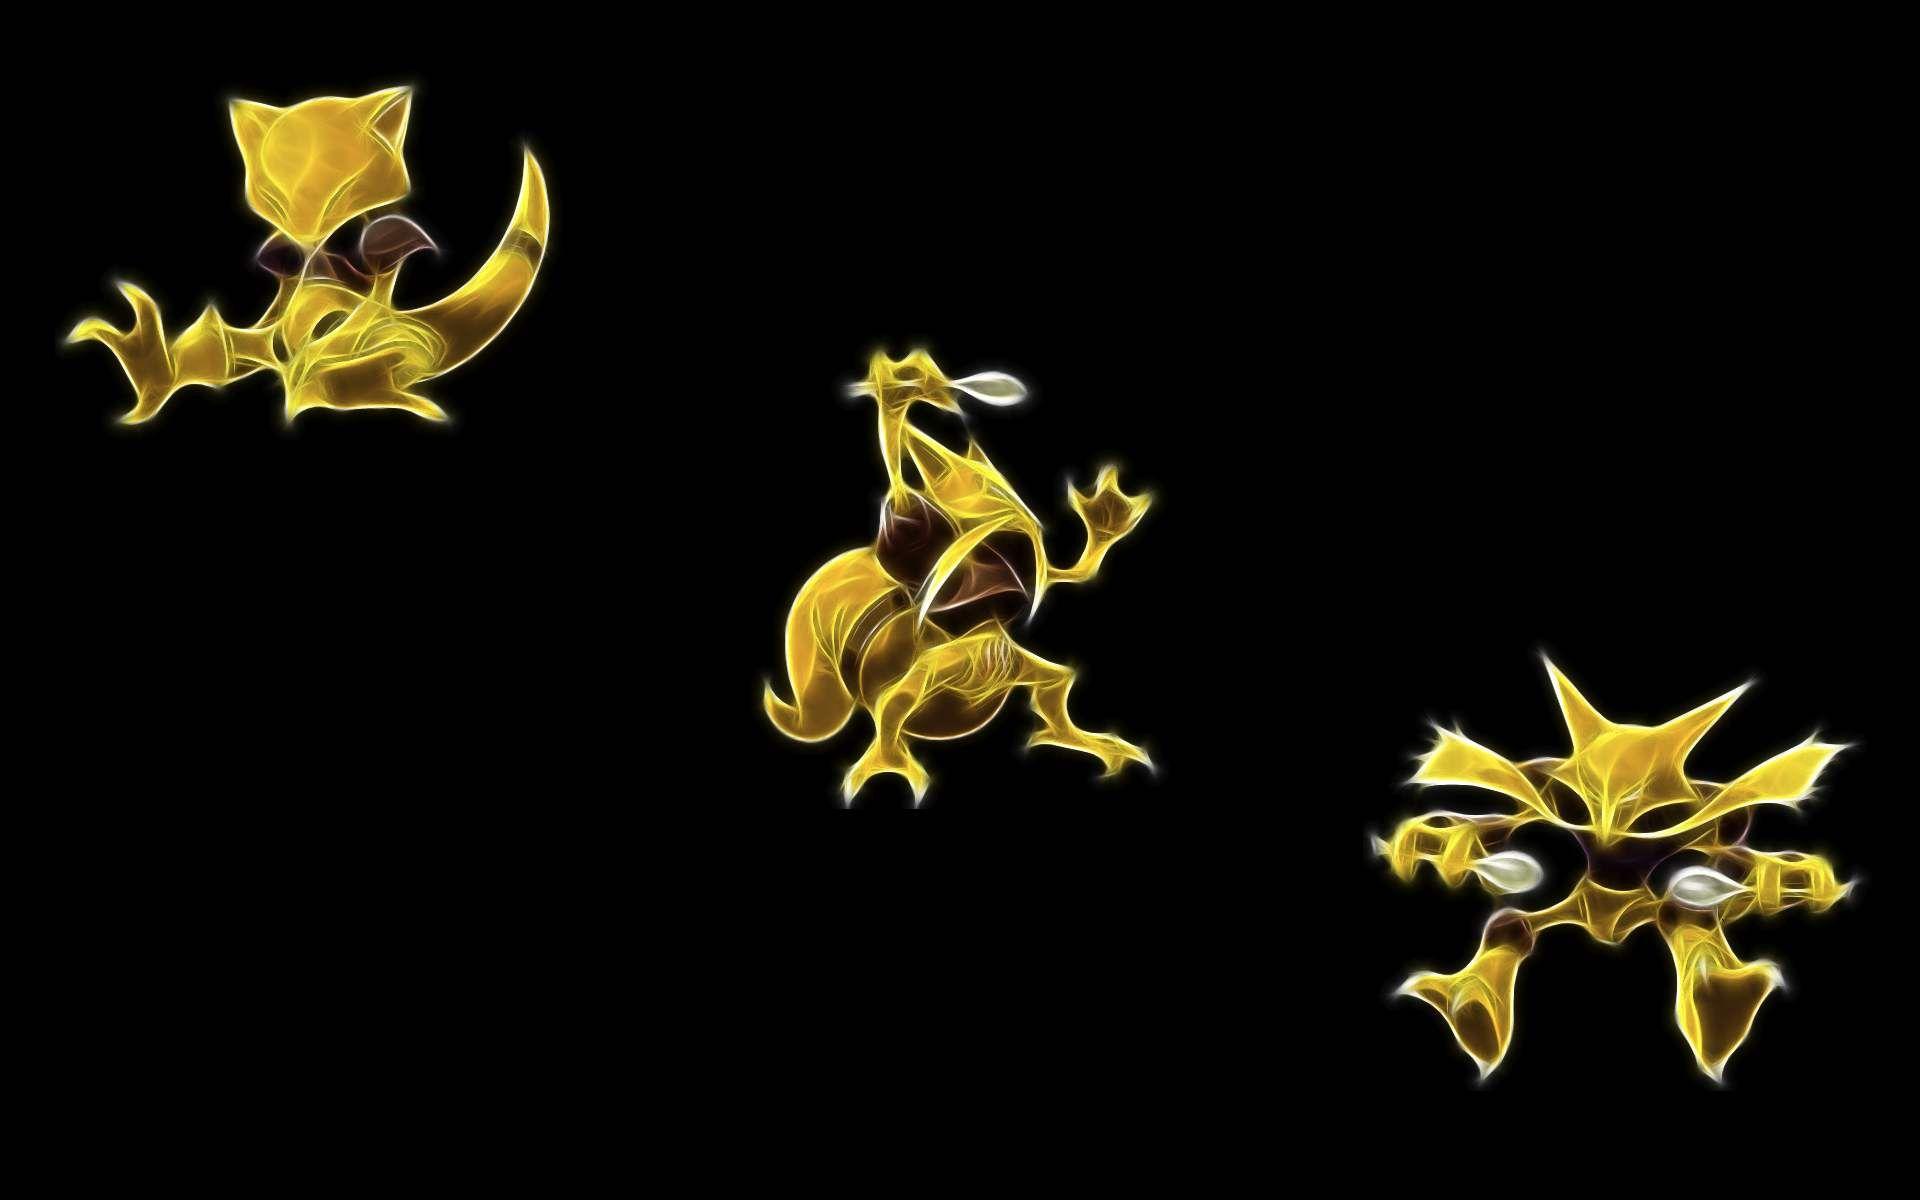 Abra Kadabra Alakazam Evolution | POKEMON :D | Pinterest ...